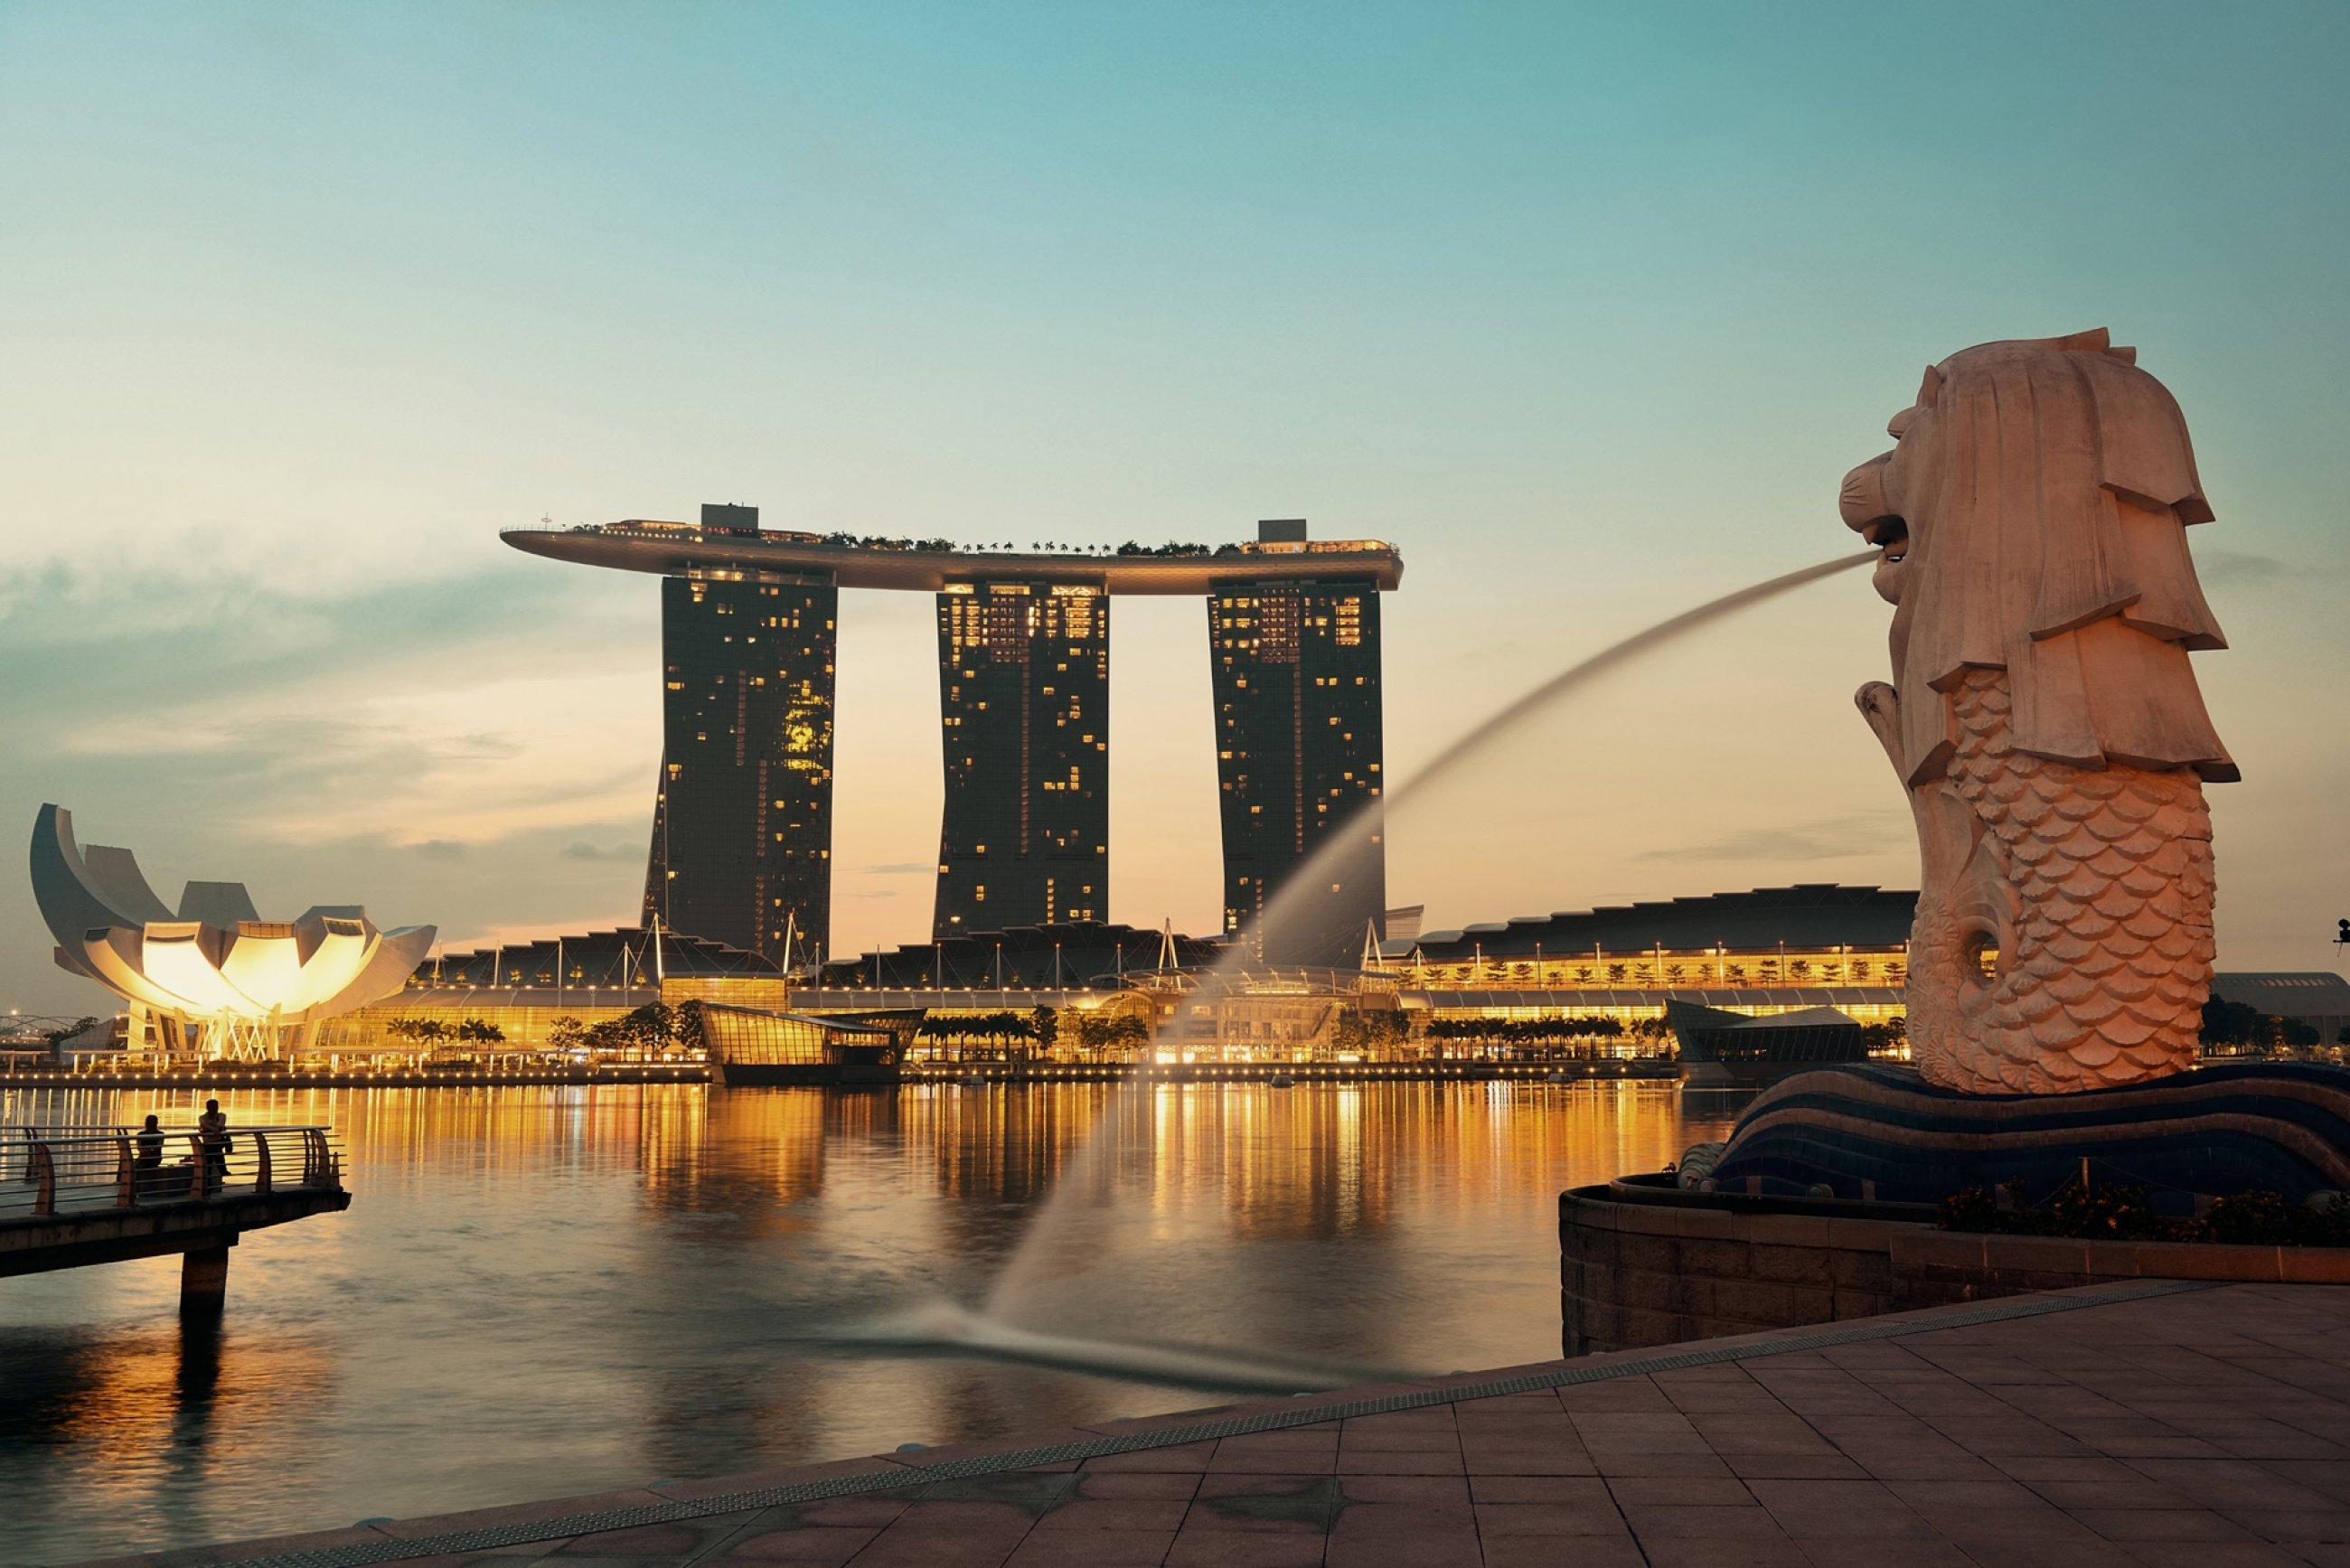 https://bubo.sk/uploads/galleries/5035/singapore-shutterstock-270411809.jpg